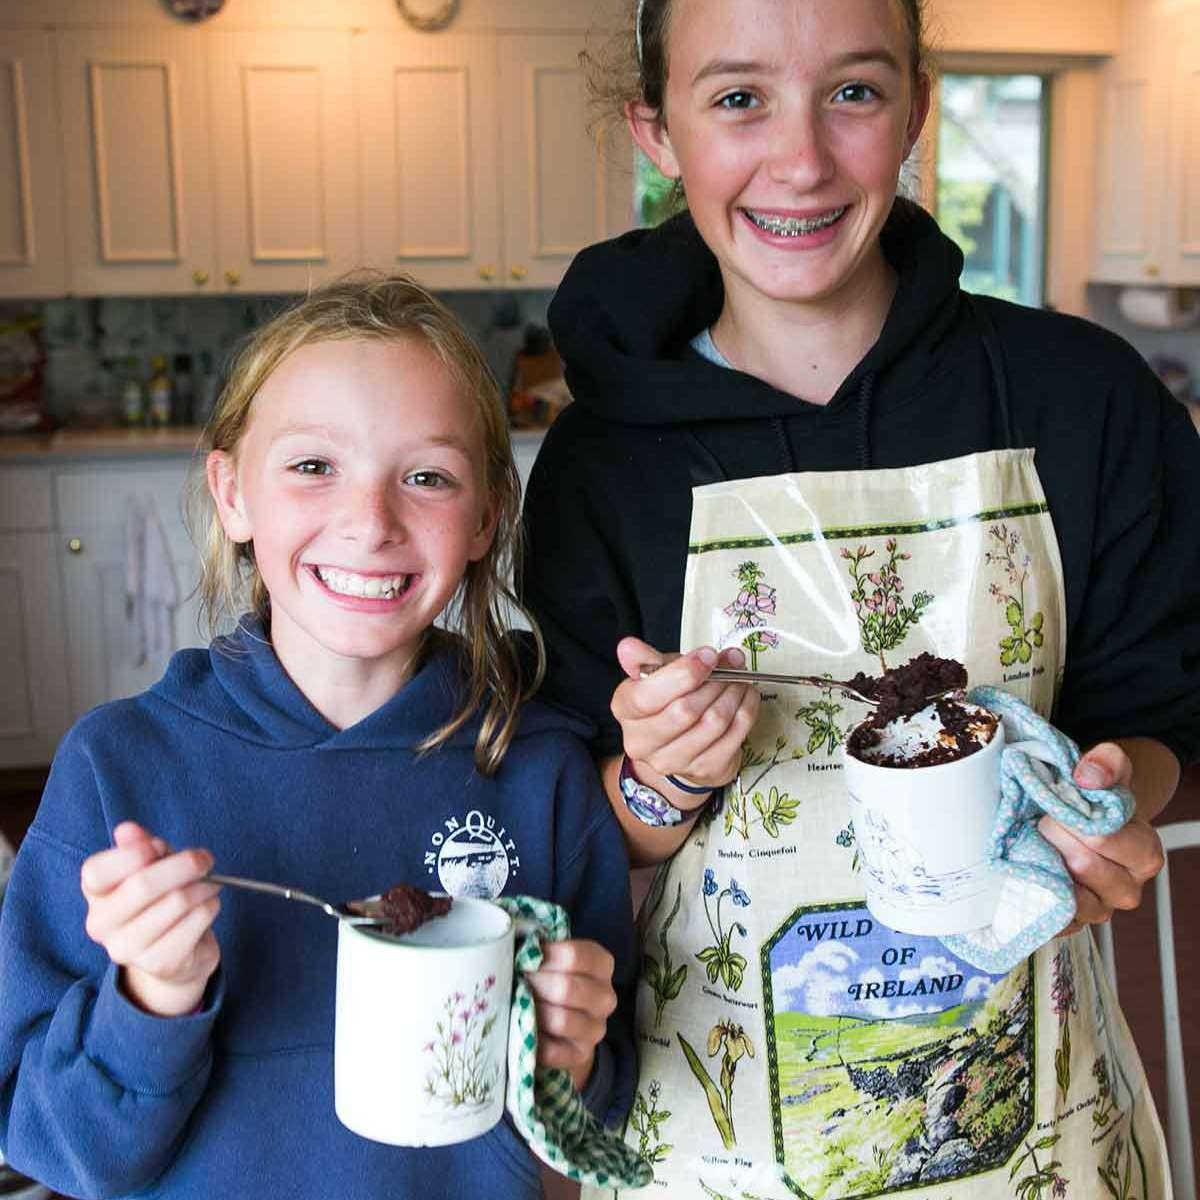 Piper and Alden eating mug brownies